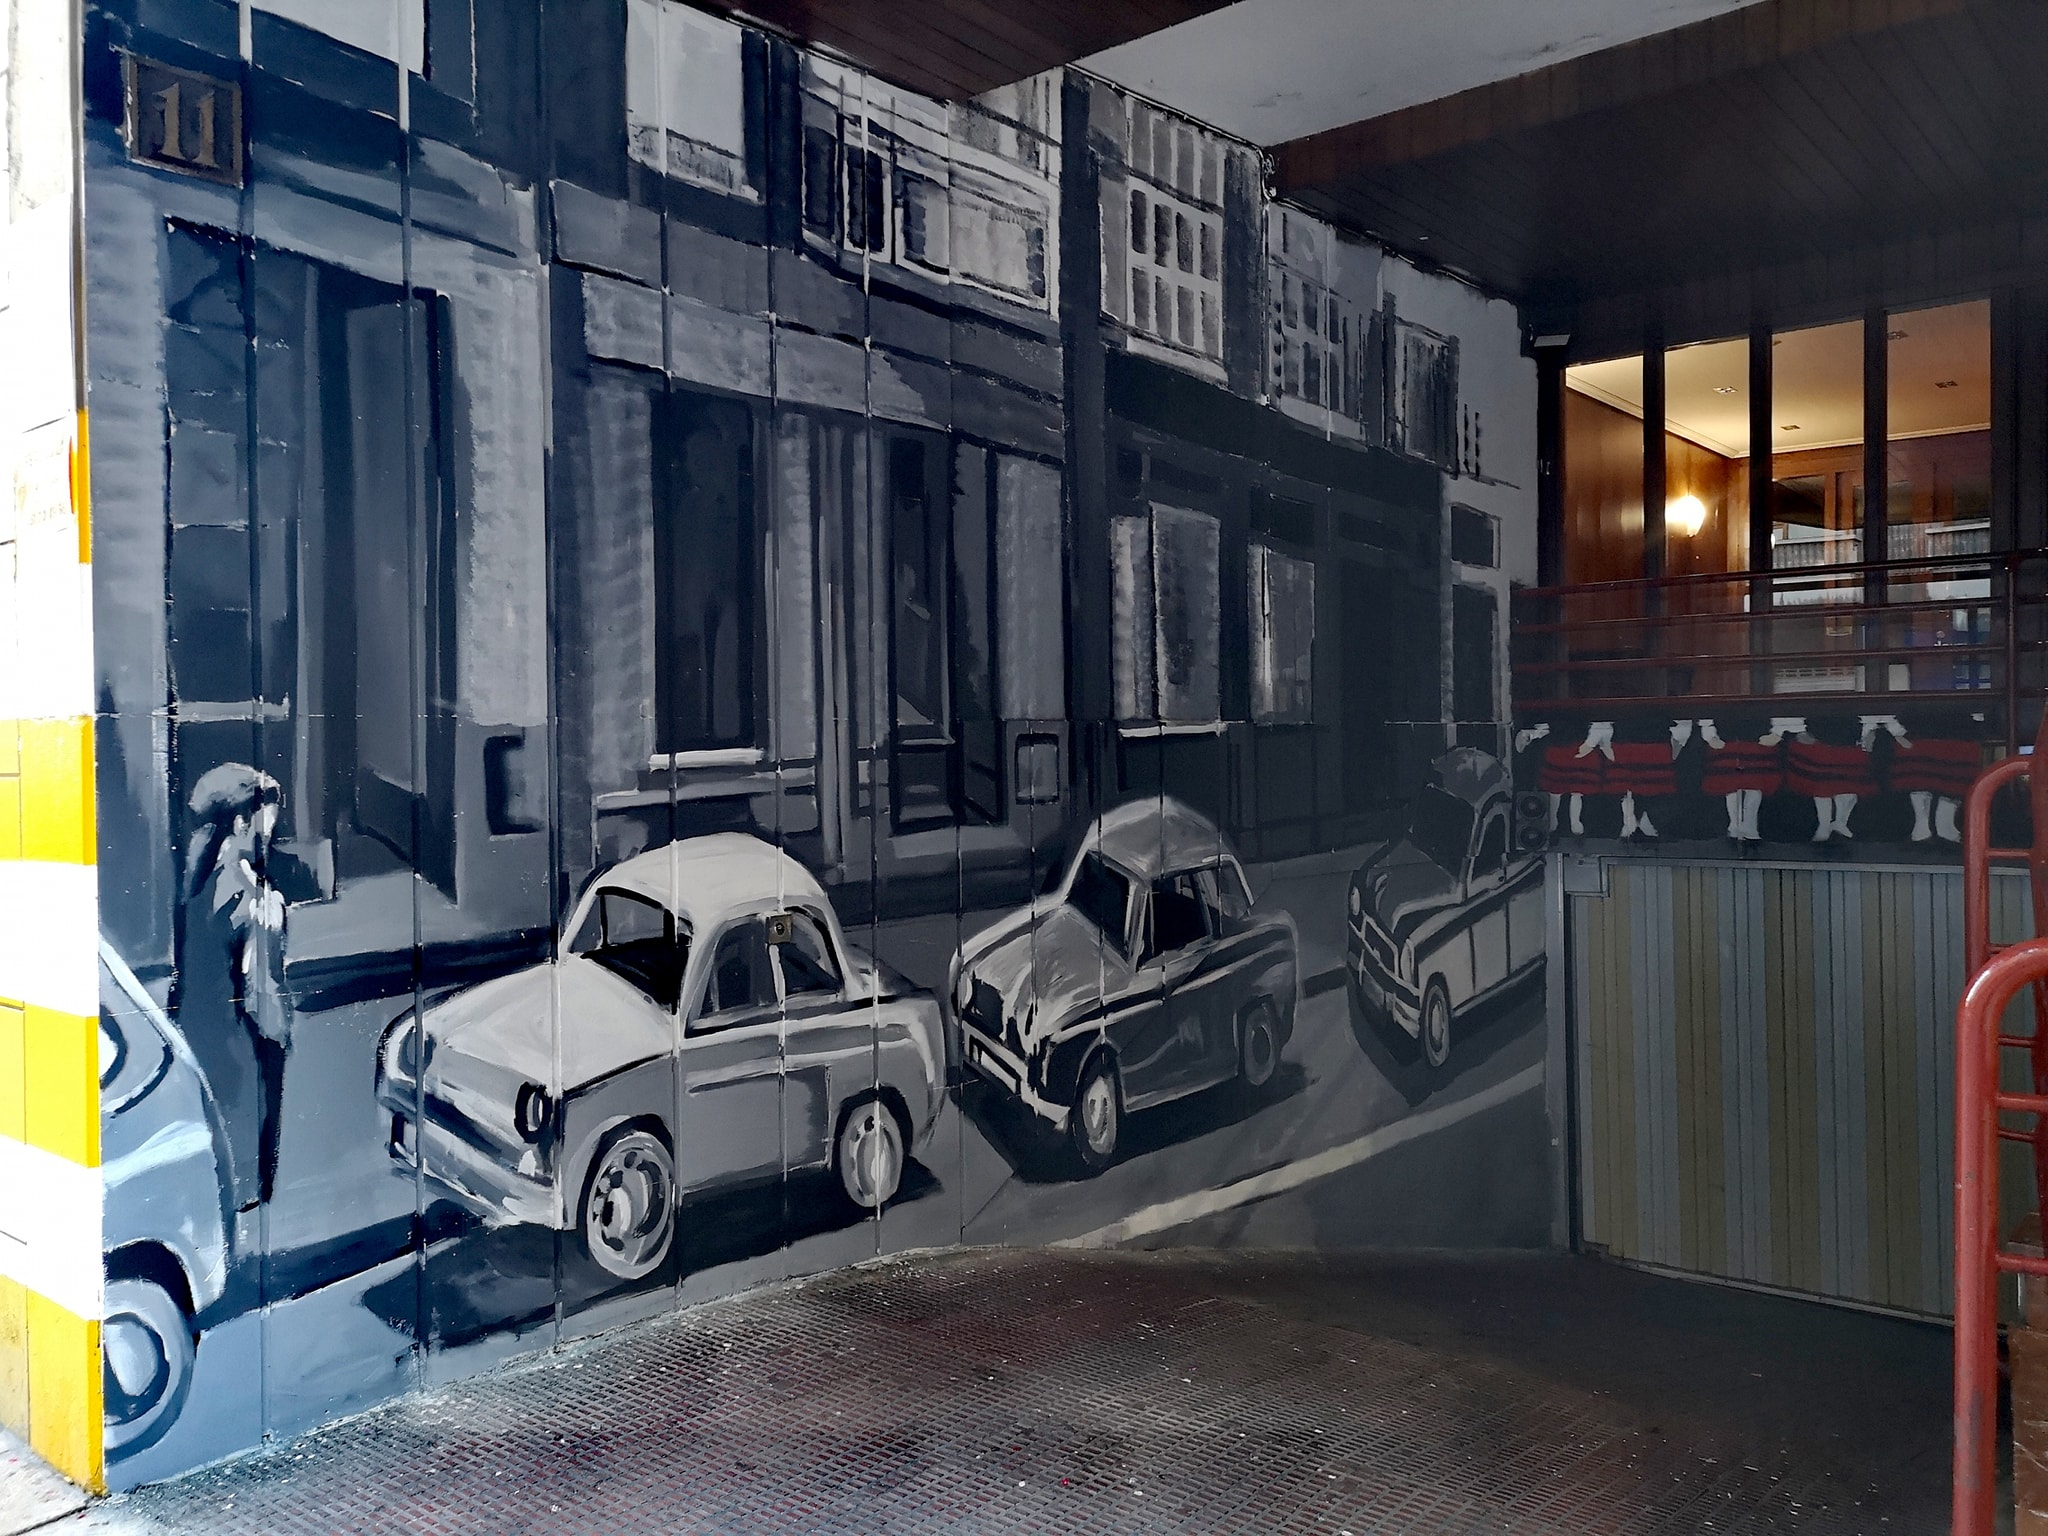 Mural Garaje #2